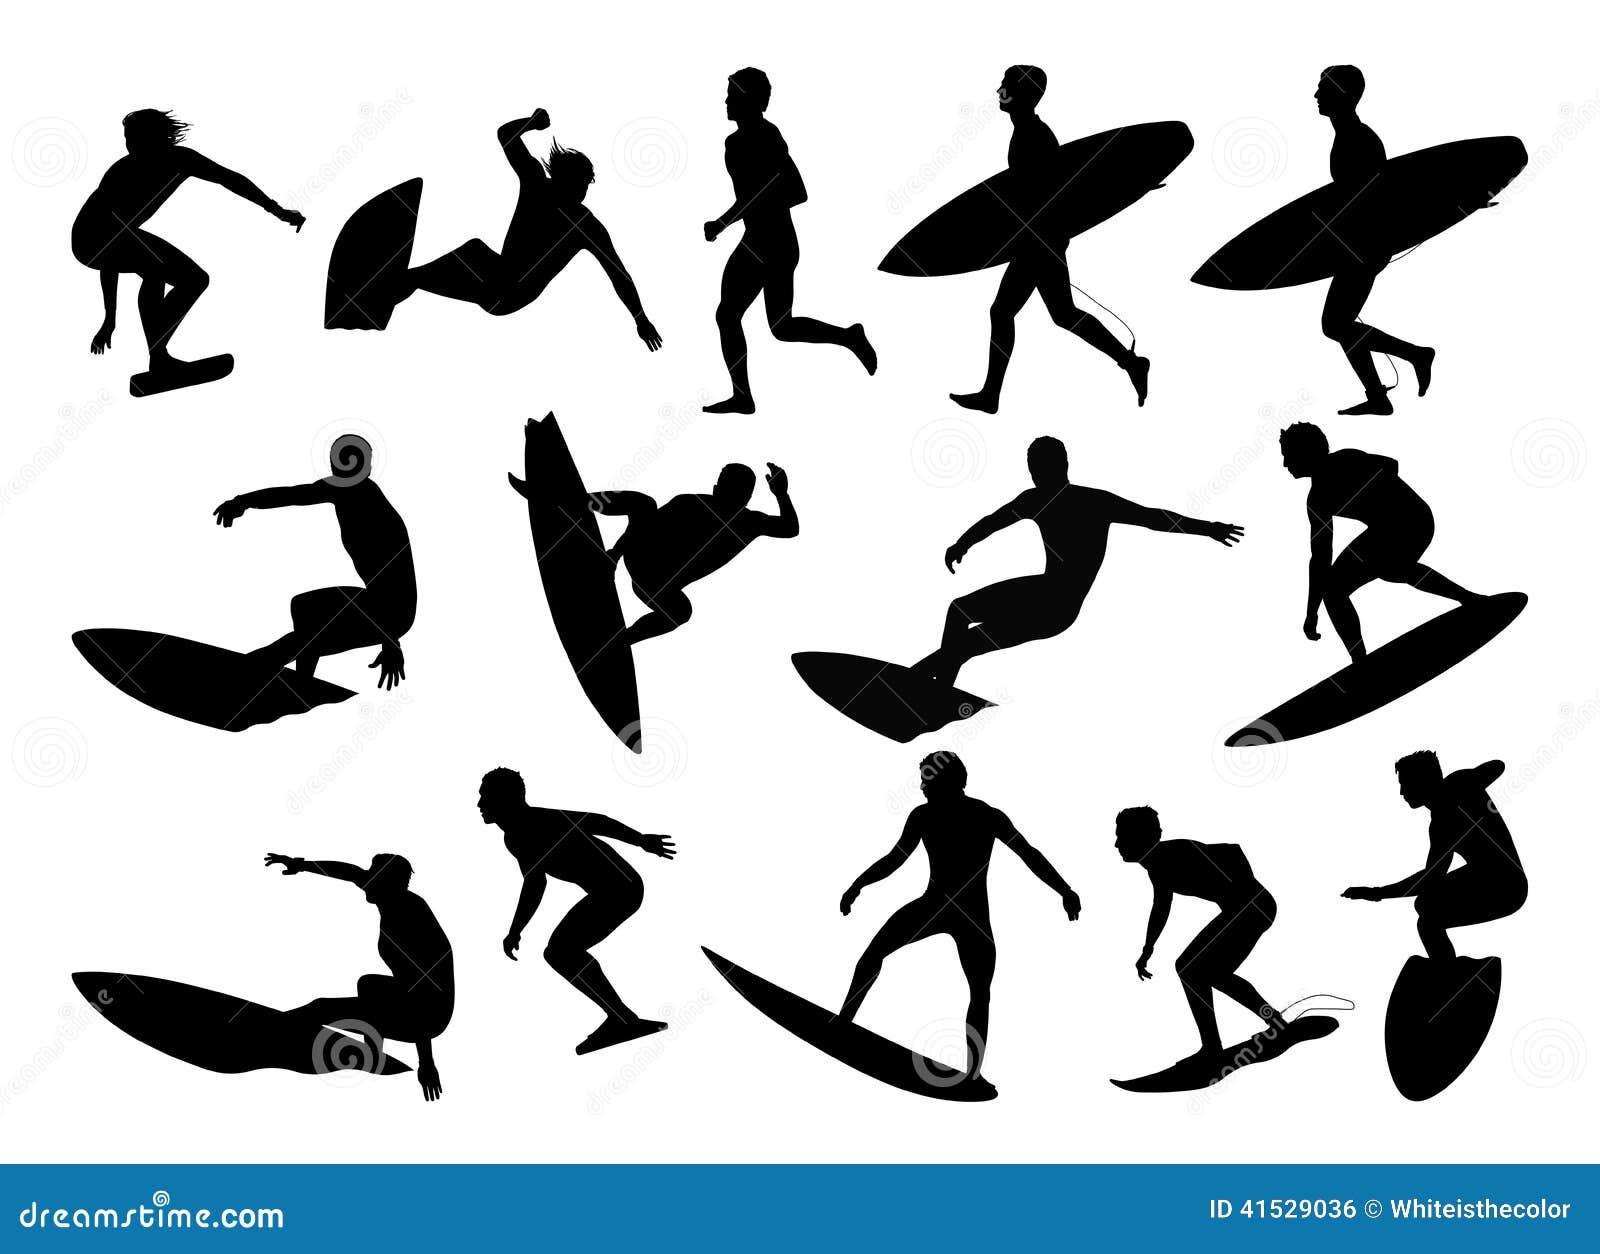 Big Set Of Surfers Silhouettes Stock Illustration